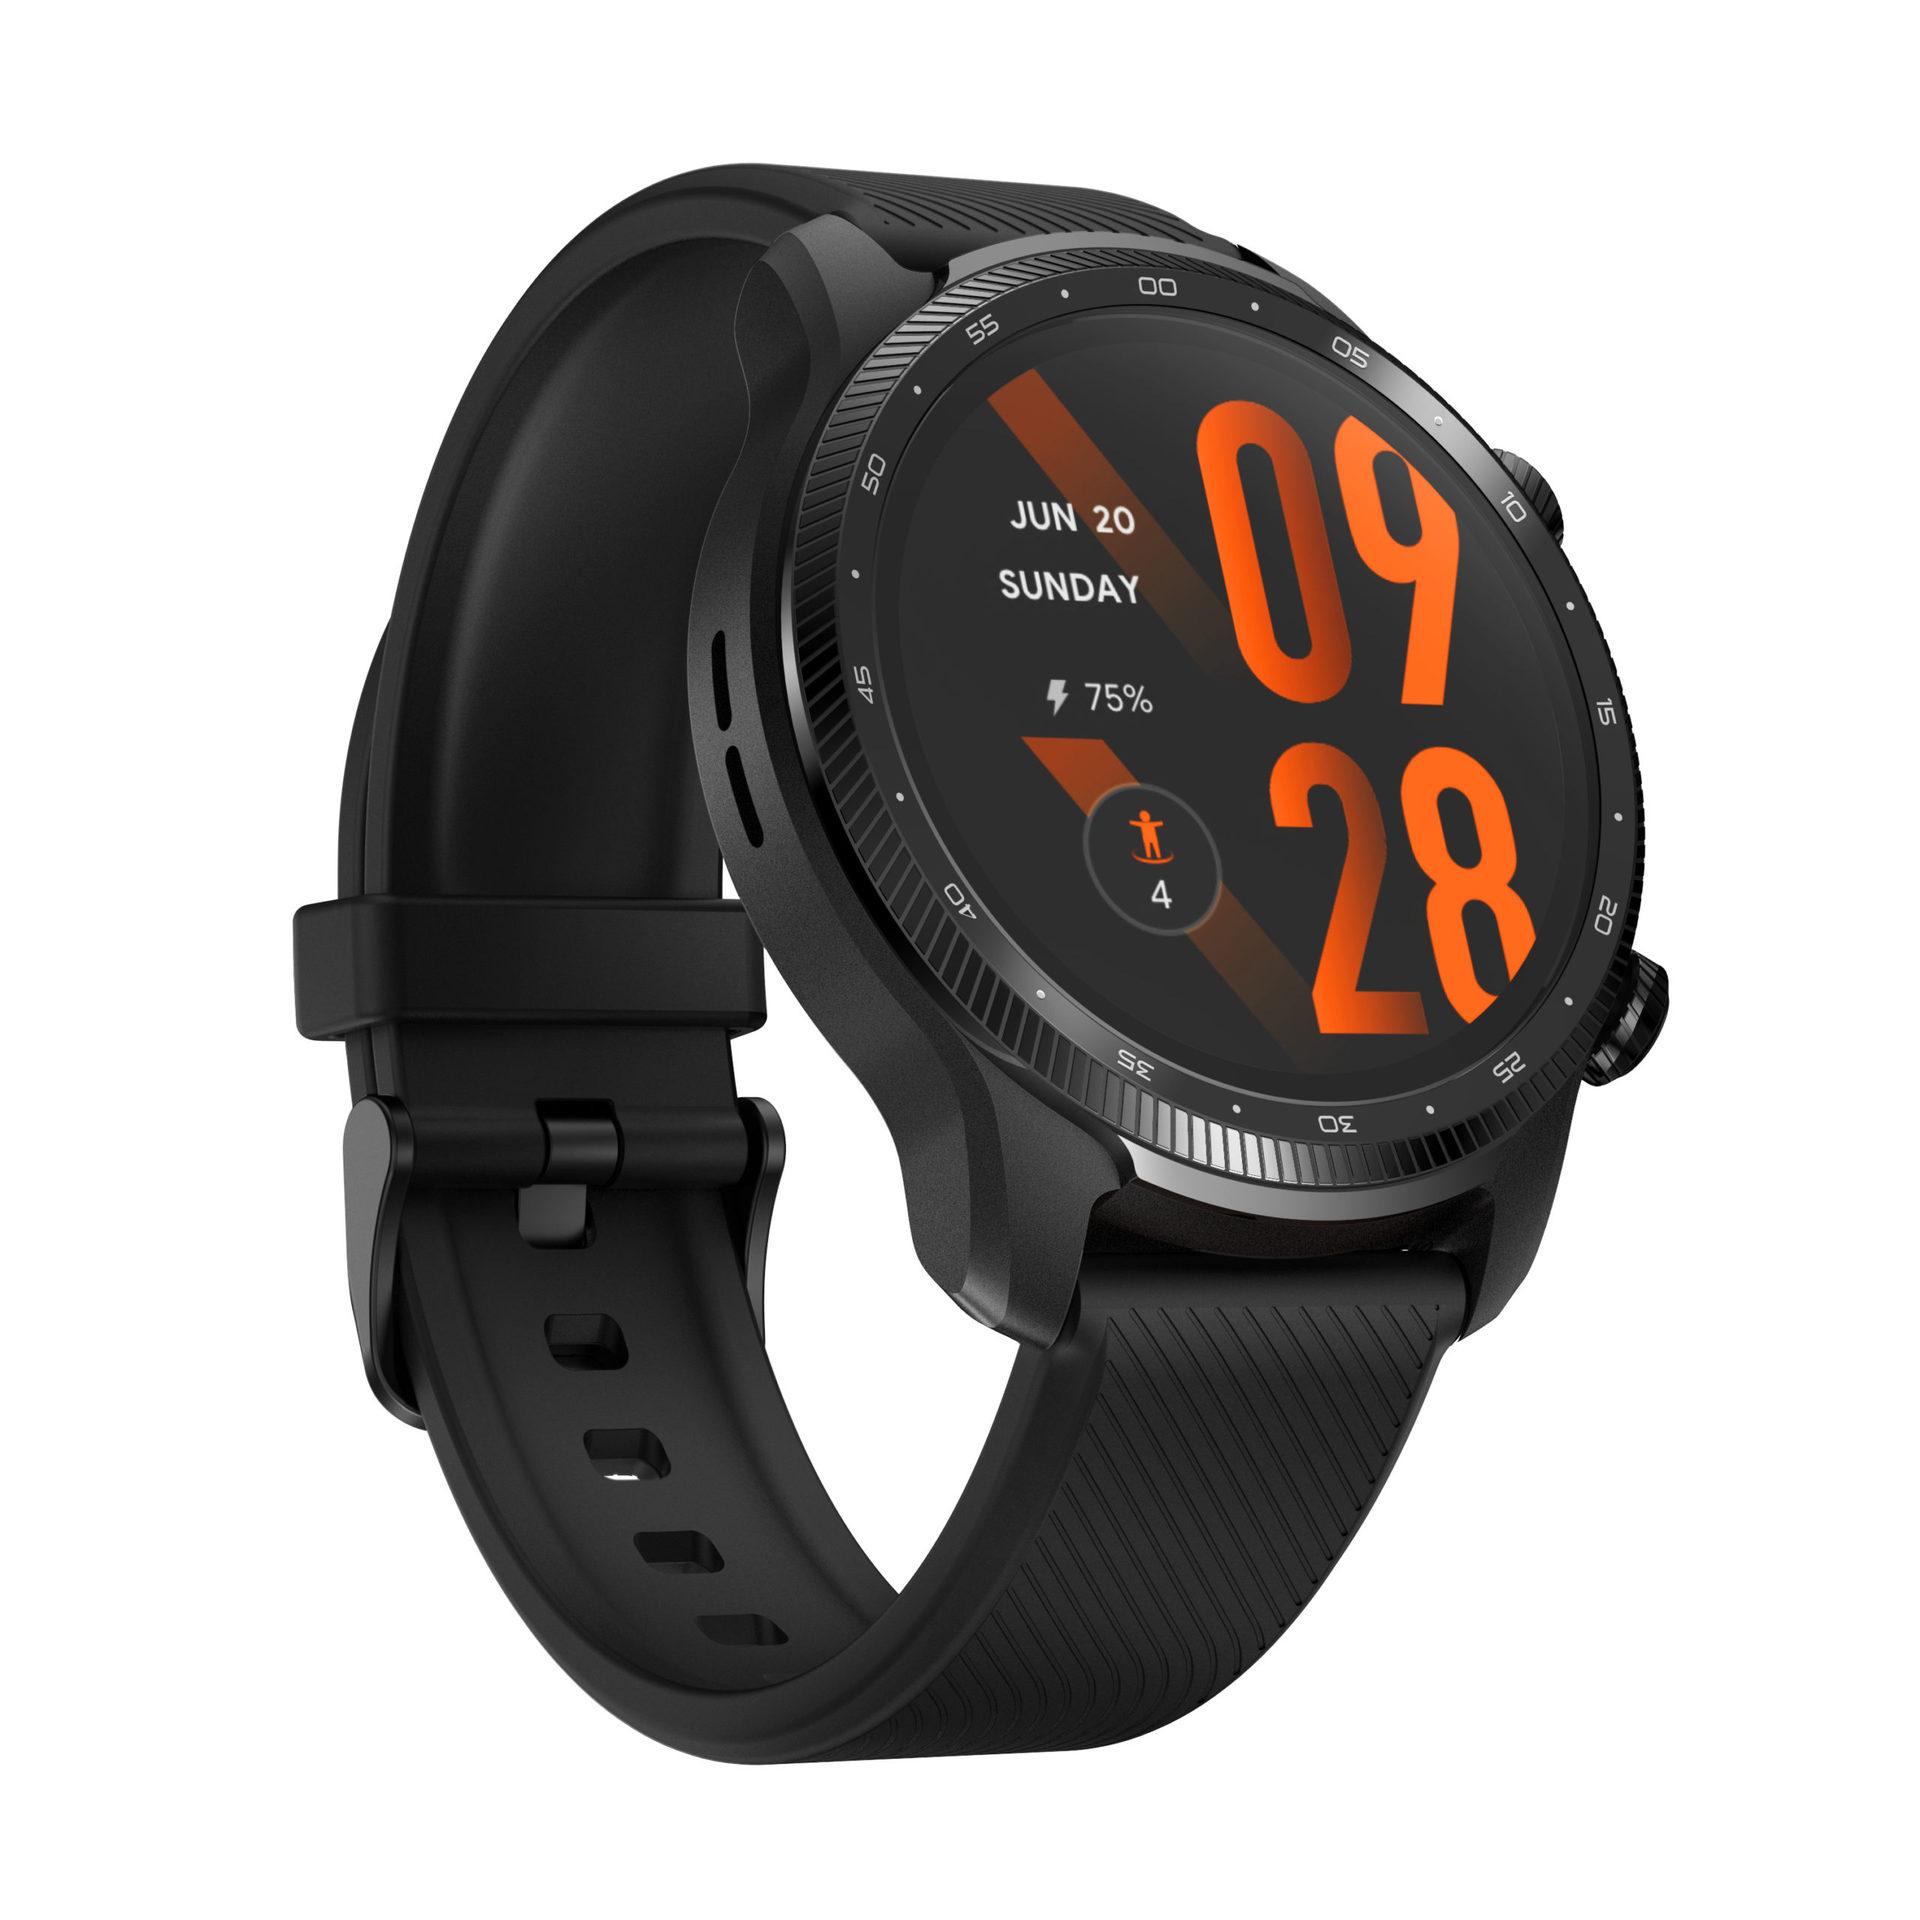 The Mobvoi TicWatch Pro 3 Ultra smartwatch in Phantom Black color.